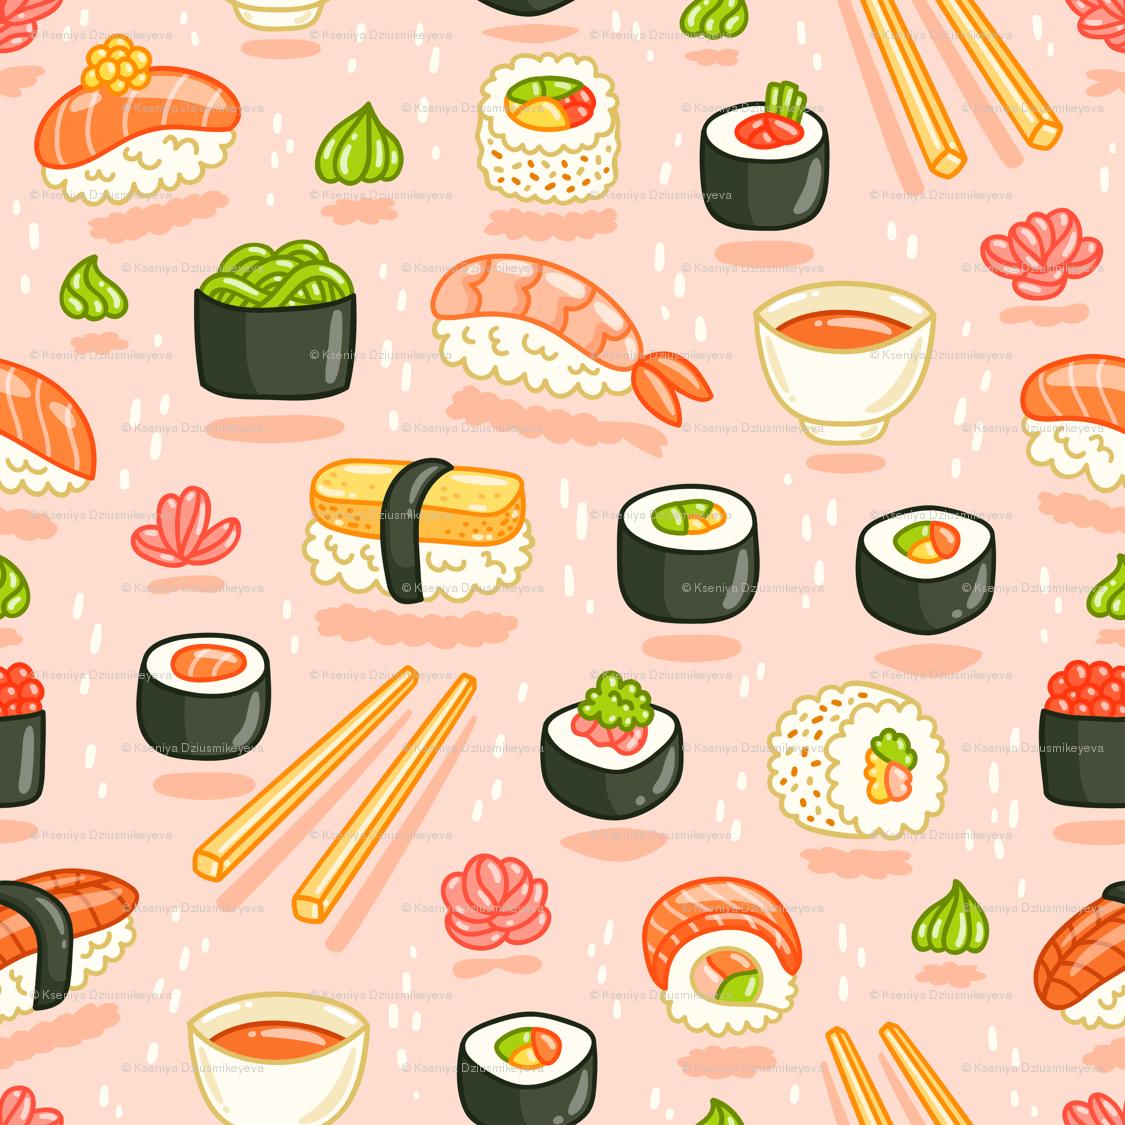 Kawaii Sushi Wallpapers on WallpaperDog 1125x1125